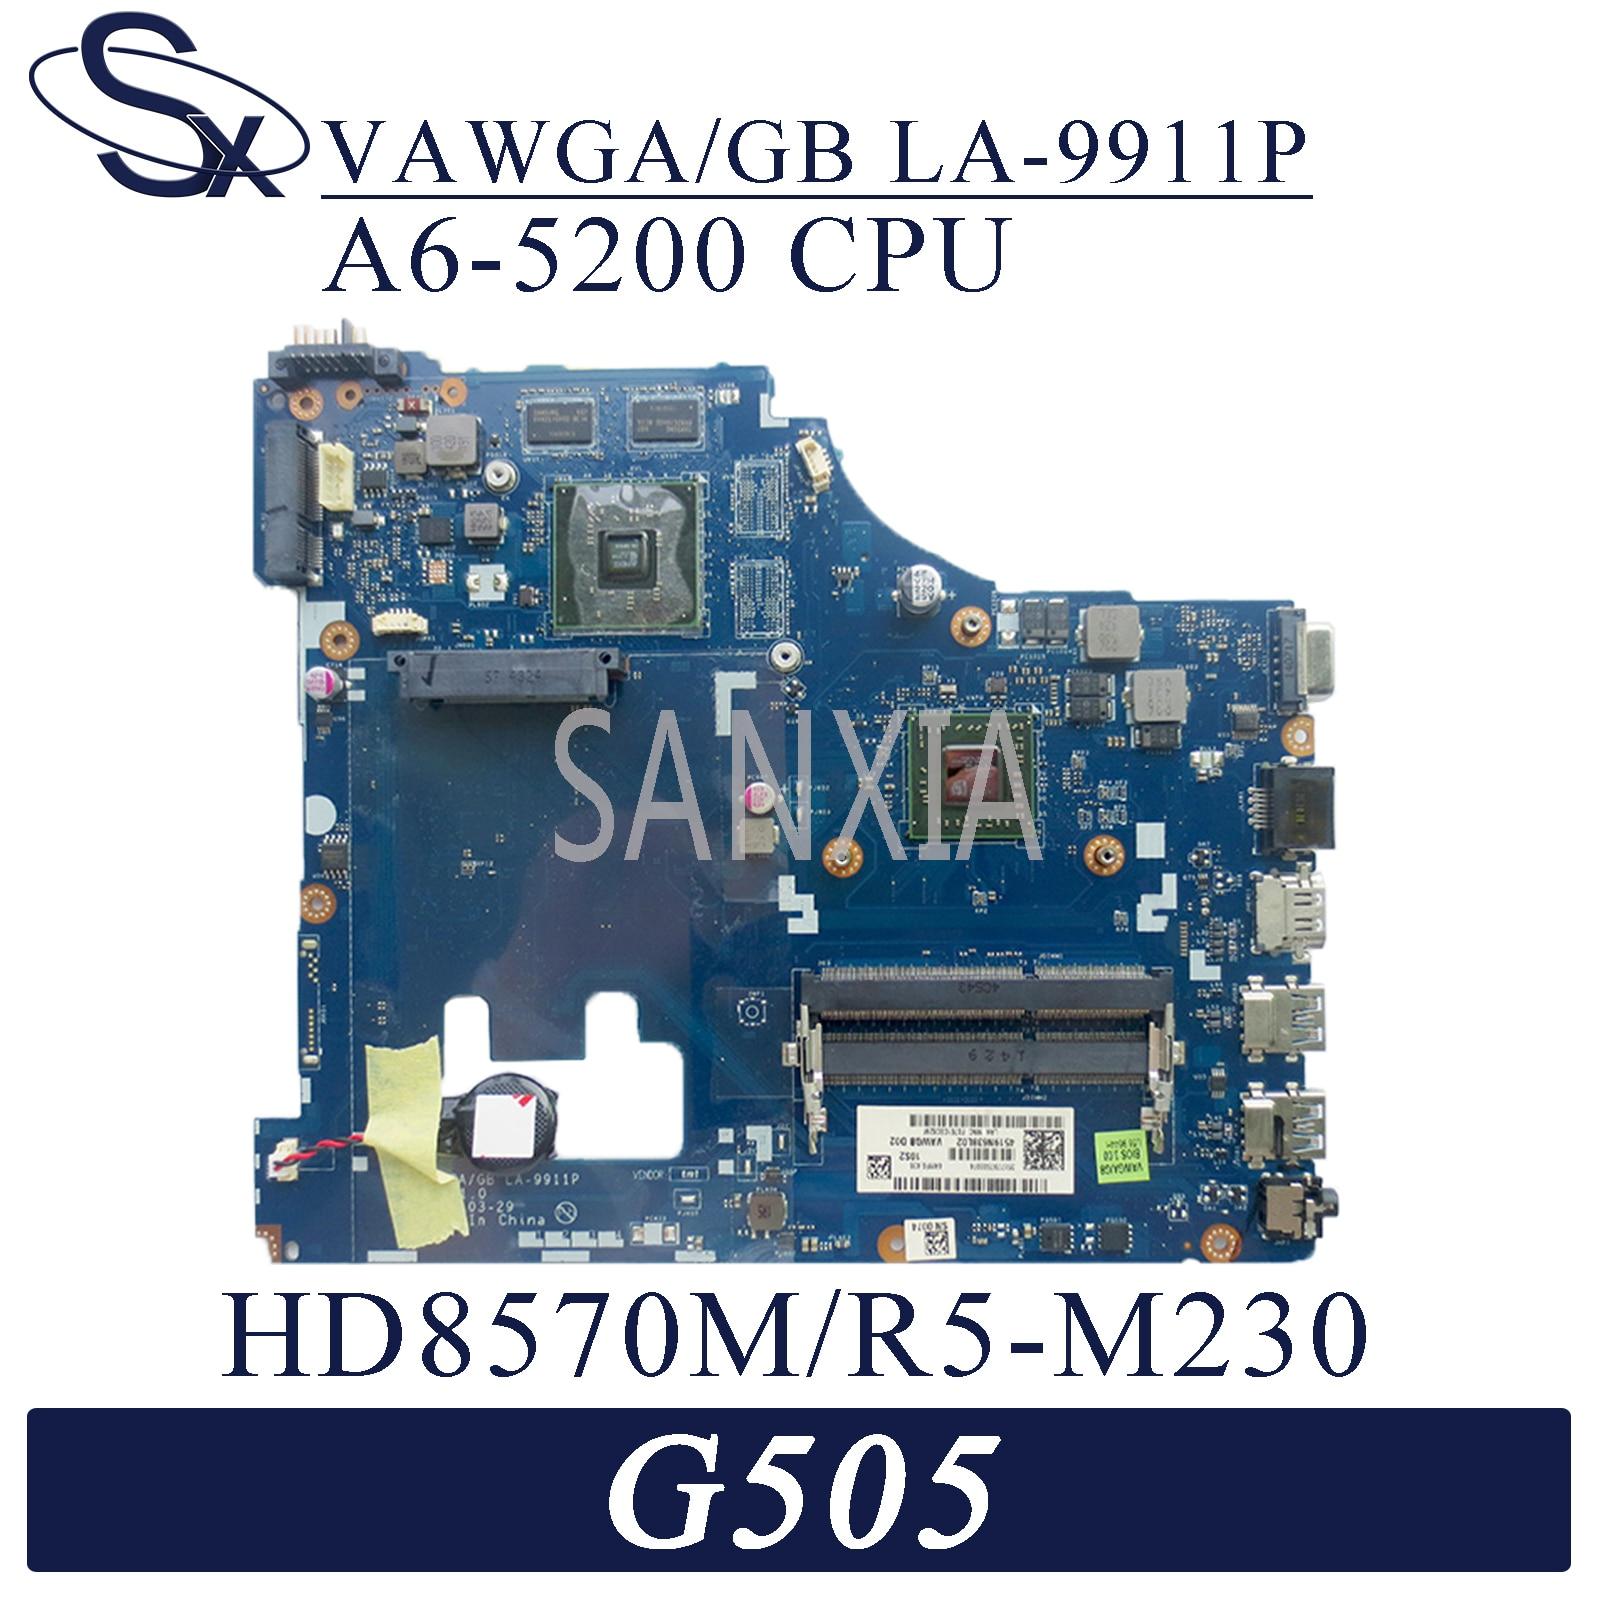 Placa base de ordenador portátil KEFU LA-9911P para Lenovo G505, placa base original AMD A6-5200 HD8570M/R5-M230